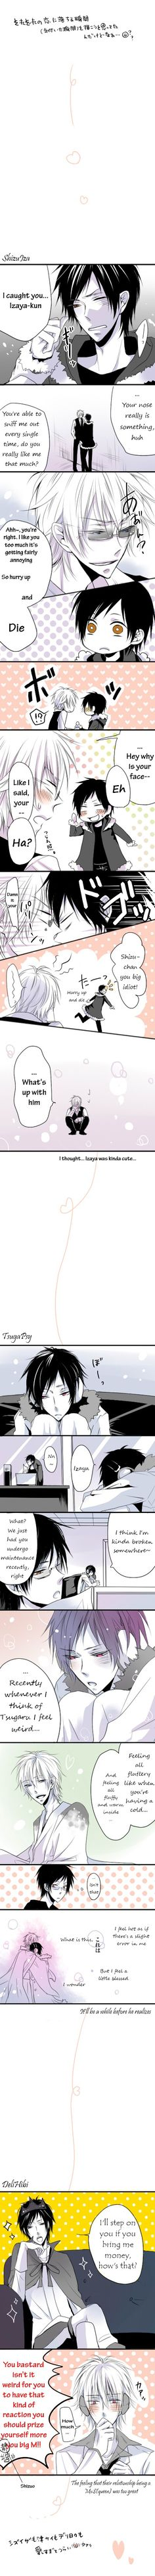 Tags: Anime, Fanart, Comic, Pixiv, Durarara!!